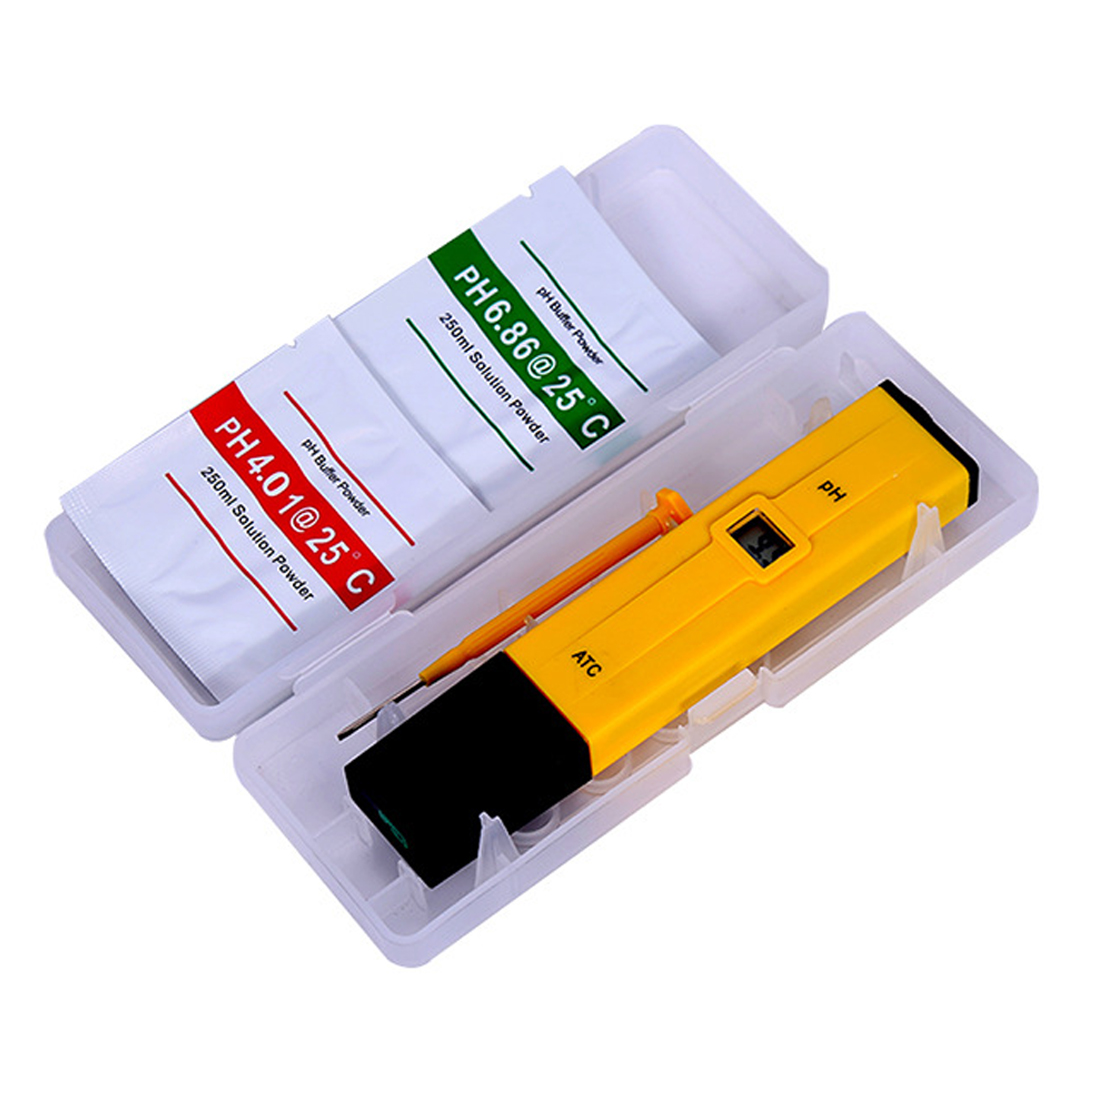 Test Tool LCD Screen Digital PH Meter Pen of Tester PH 0.0-14.0 Aquarium Pool Water Quality Wine Urine Automatic Calibration